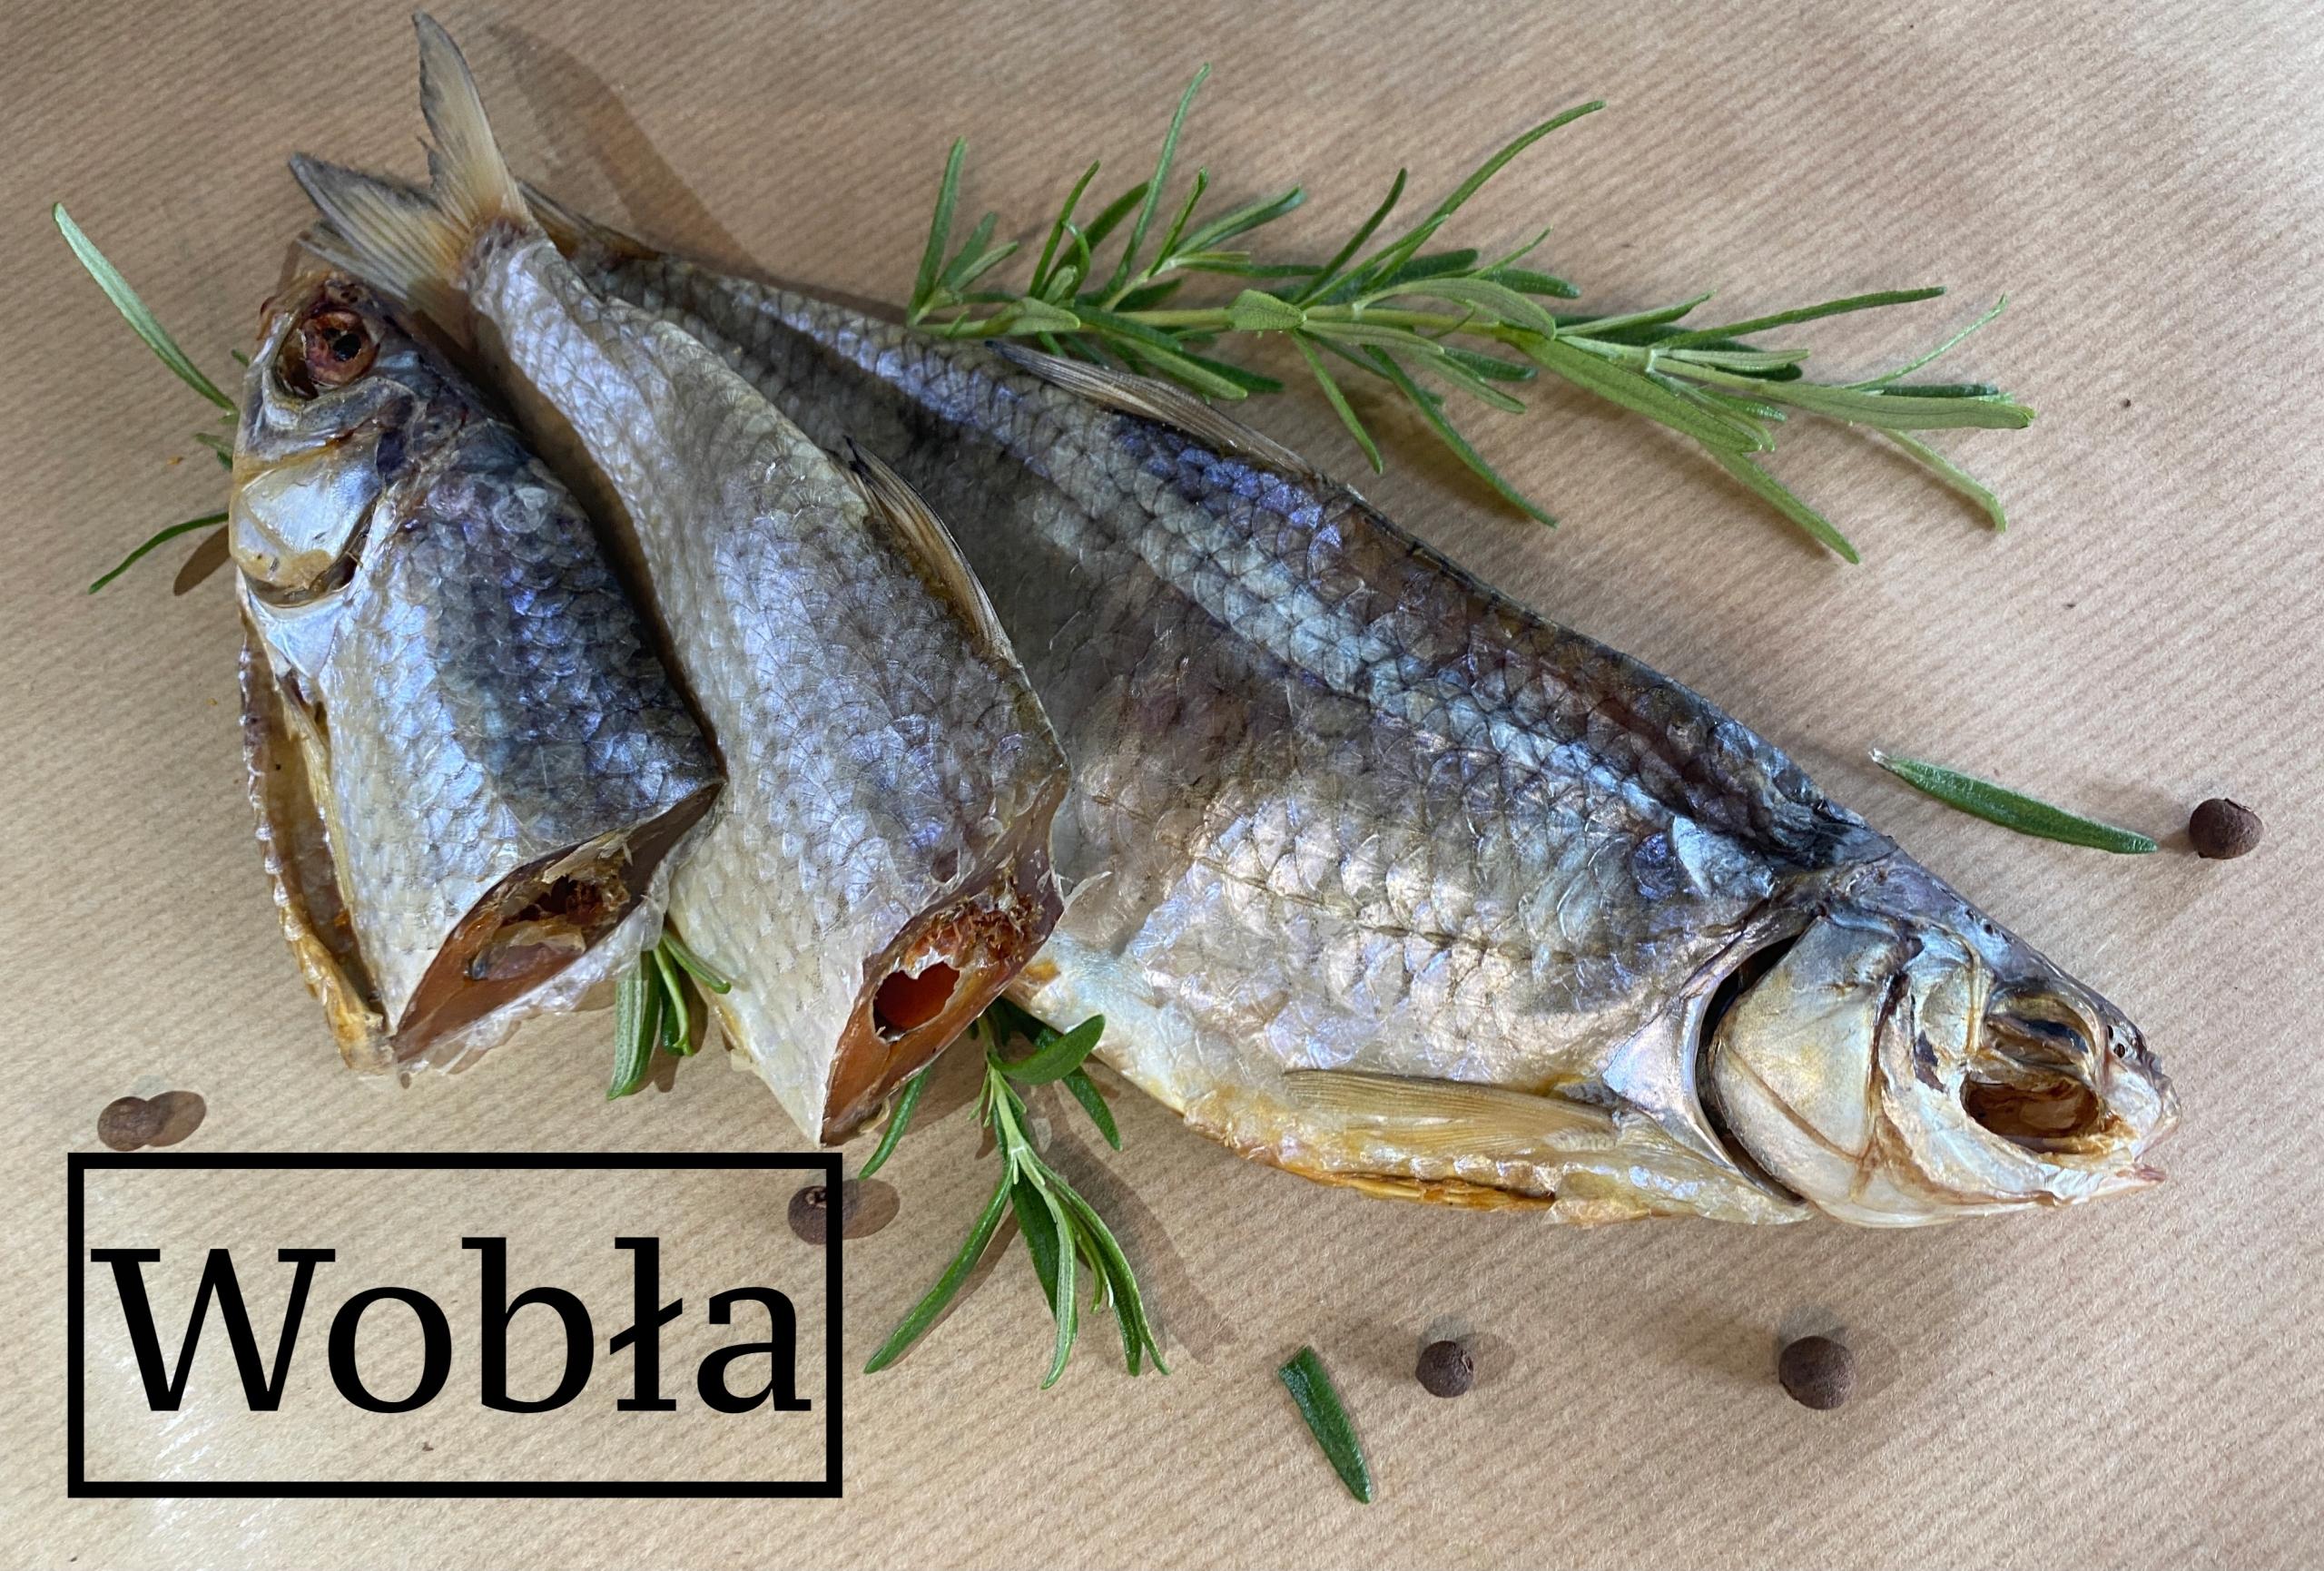 Вобла (каспийская плотва) Сушеная рыба 500 +/- 10 г x 10 шт.